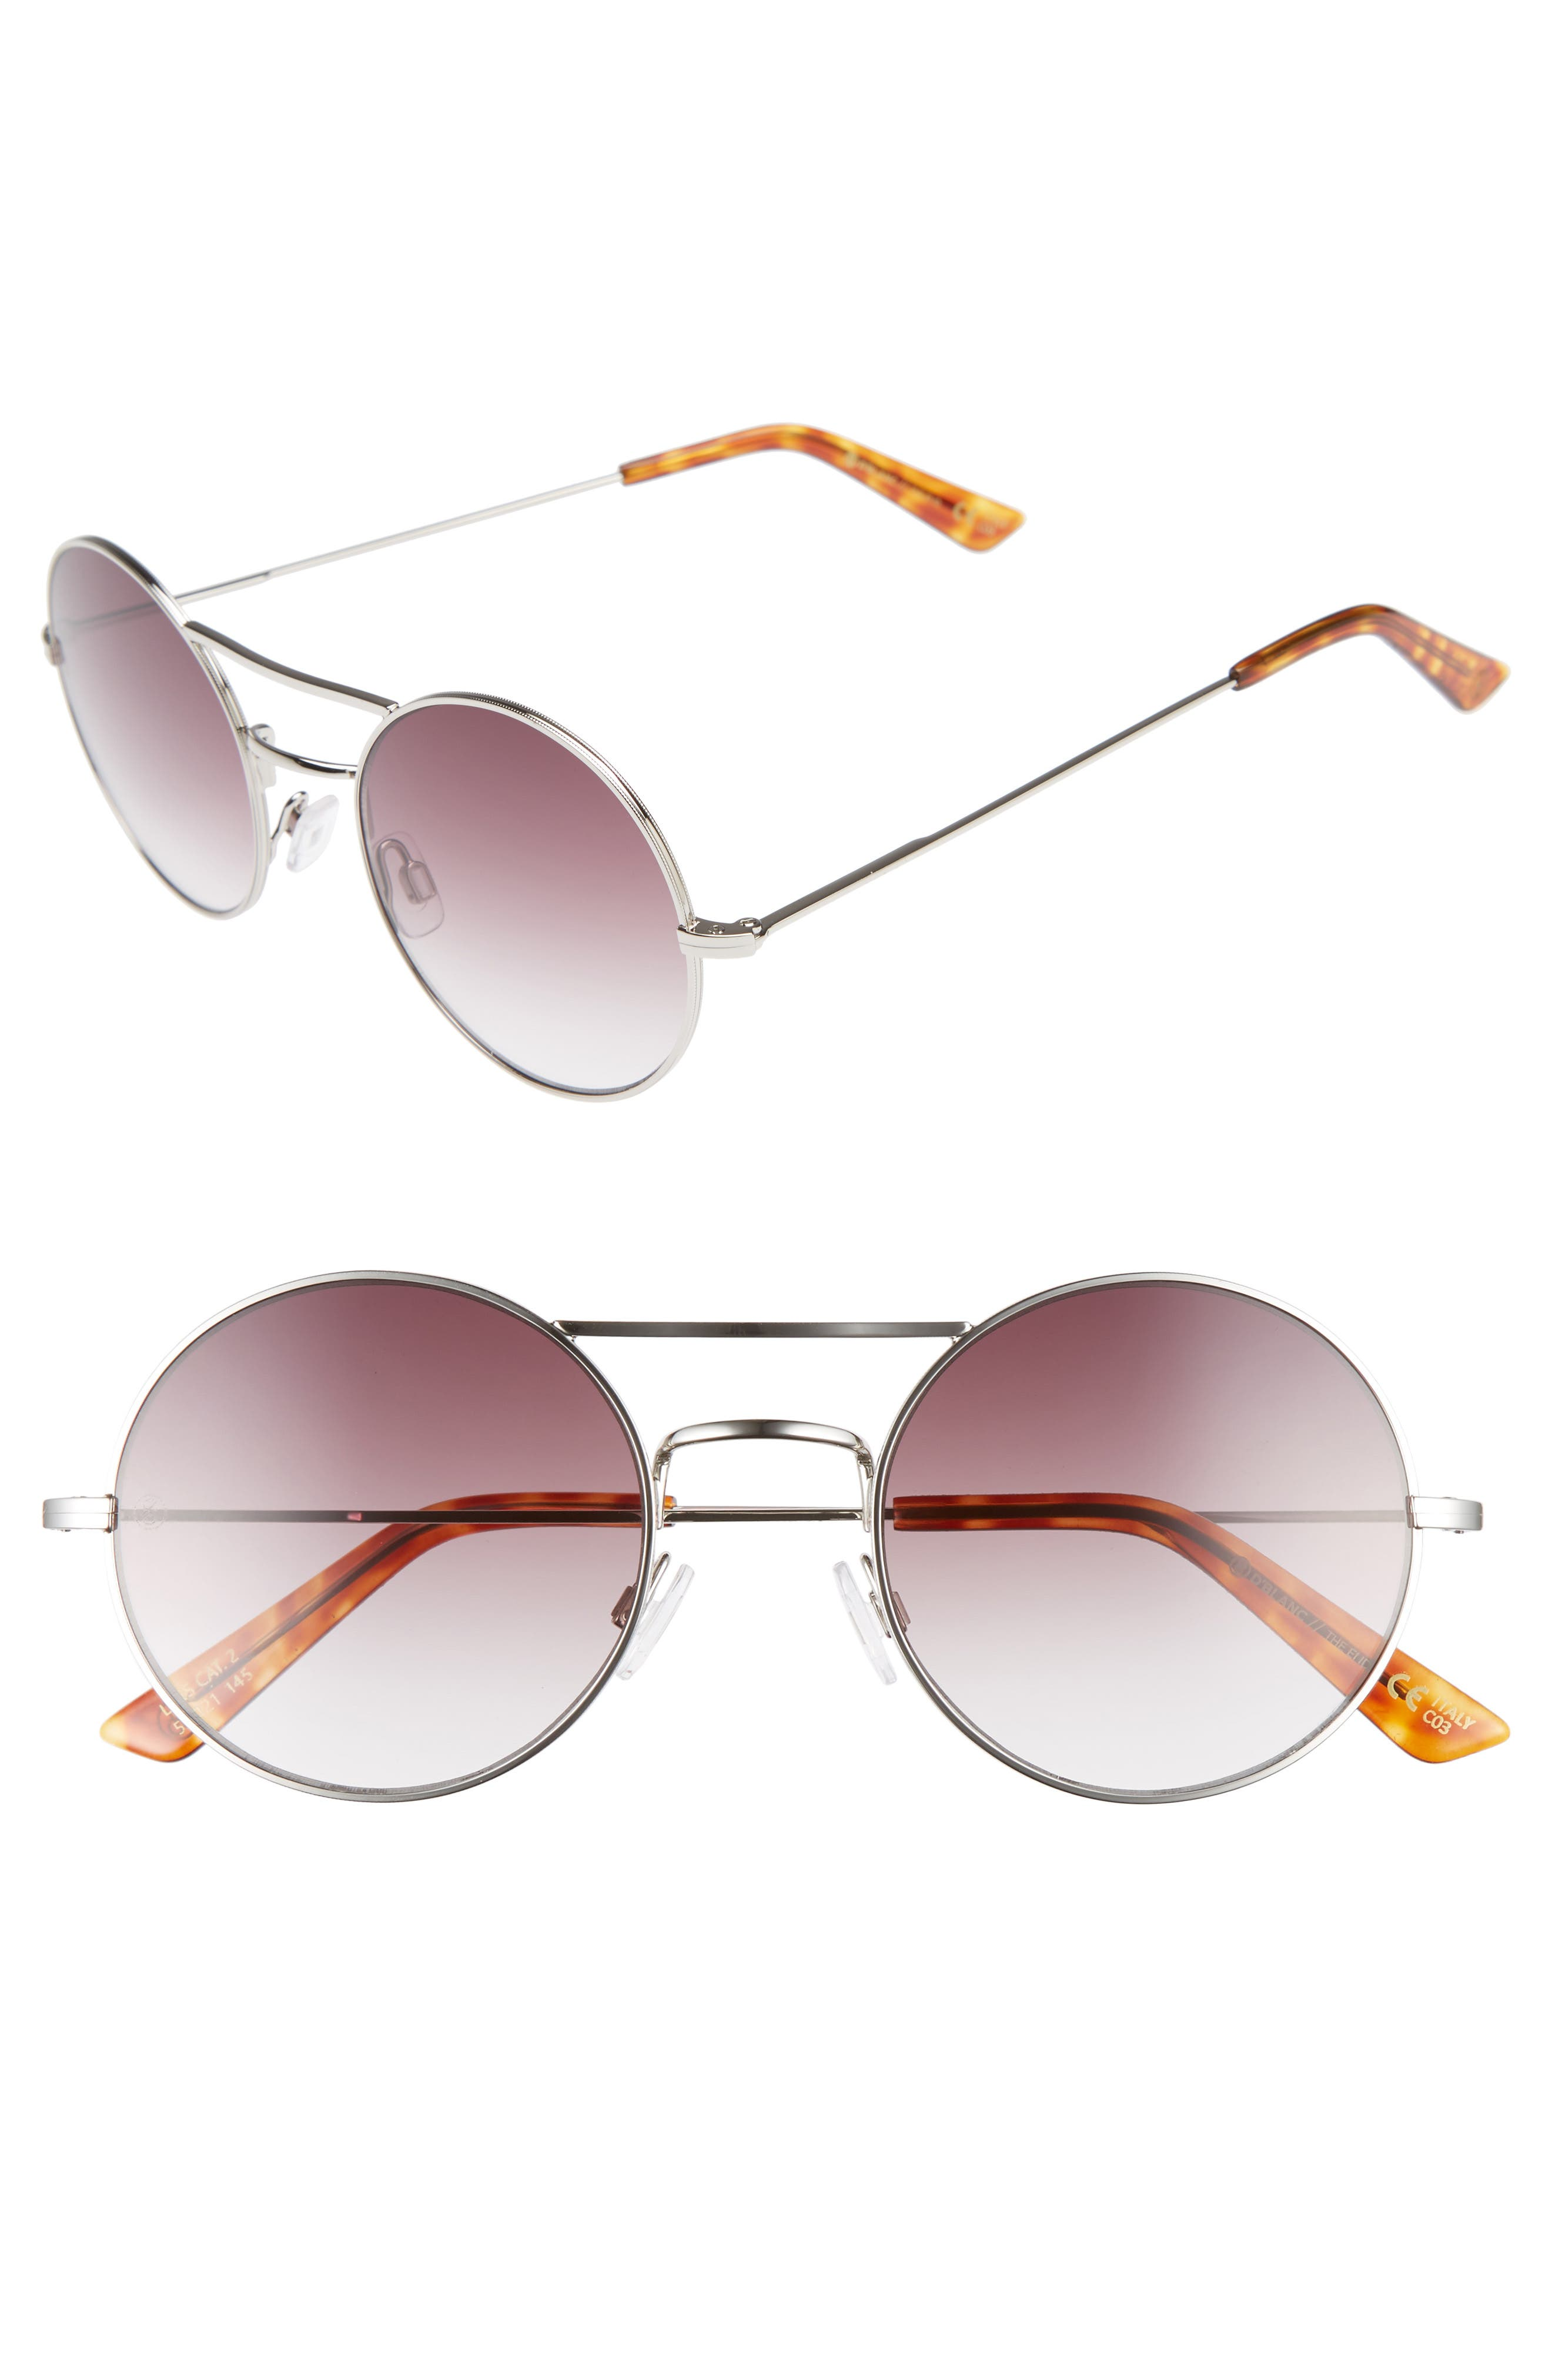 D'BLANC The End 52mm Gradient Round Sunglasses,                         Main,                         color, 040